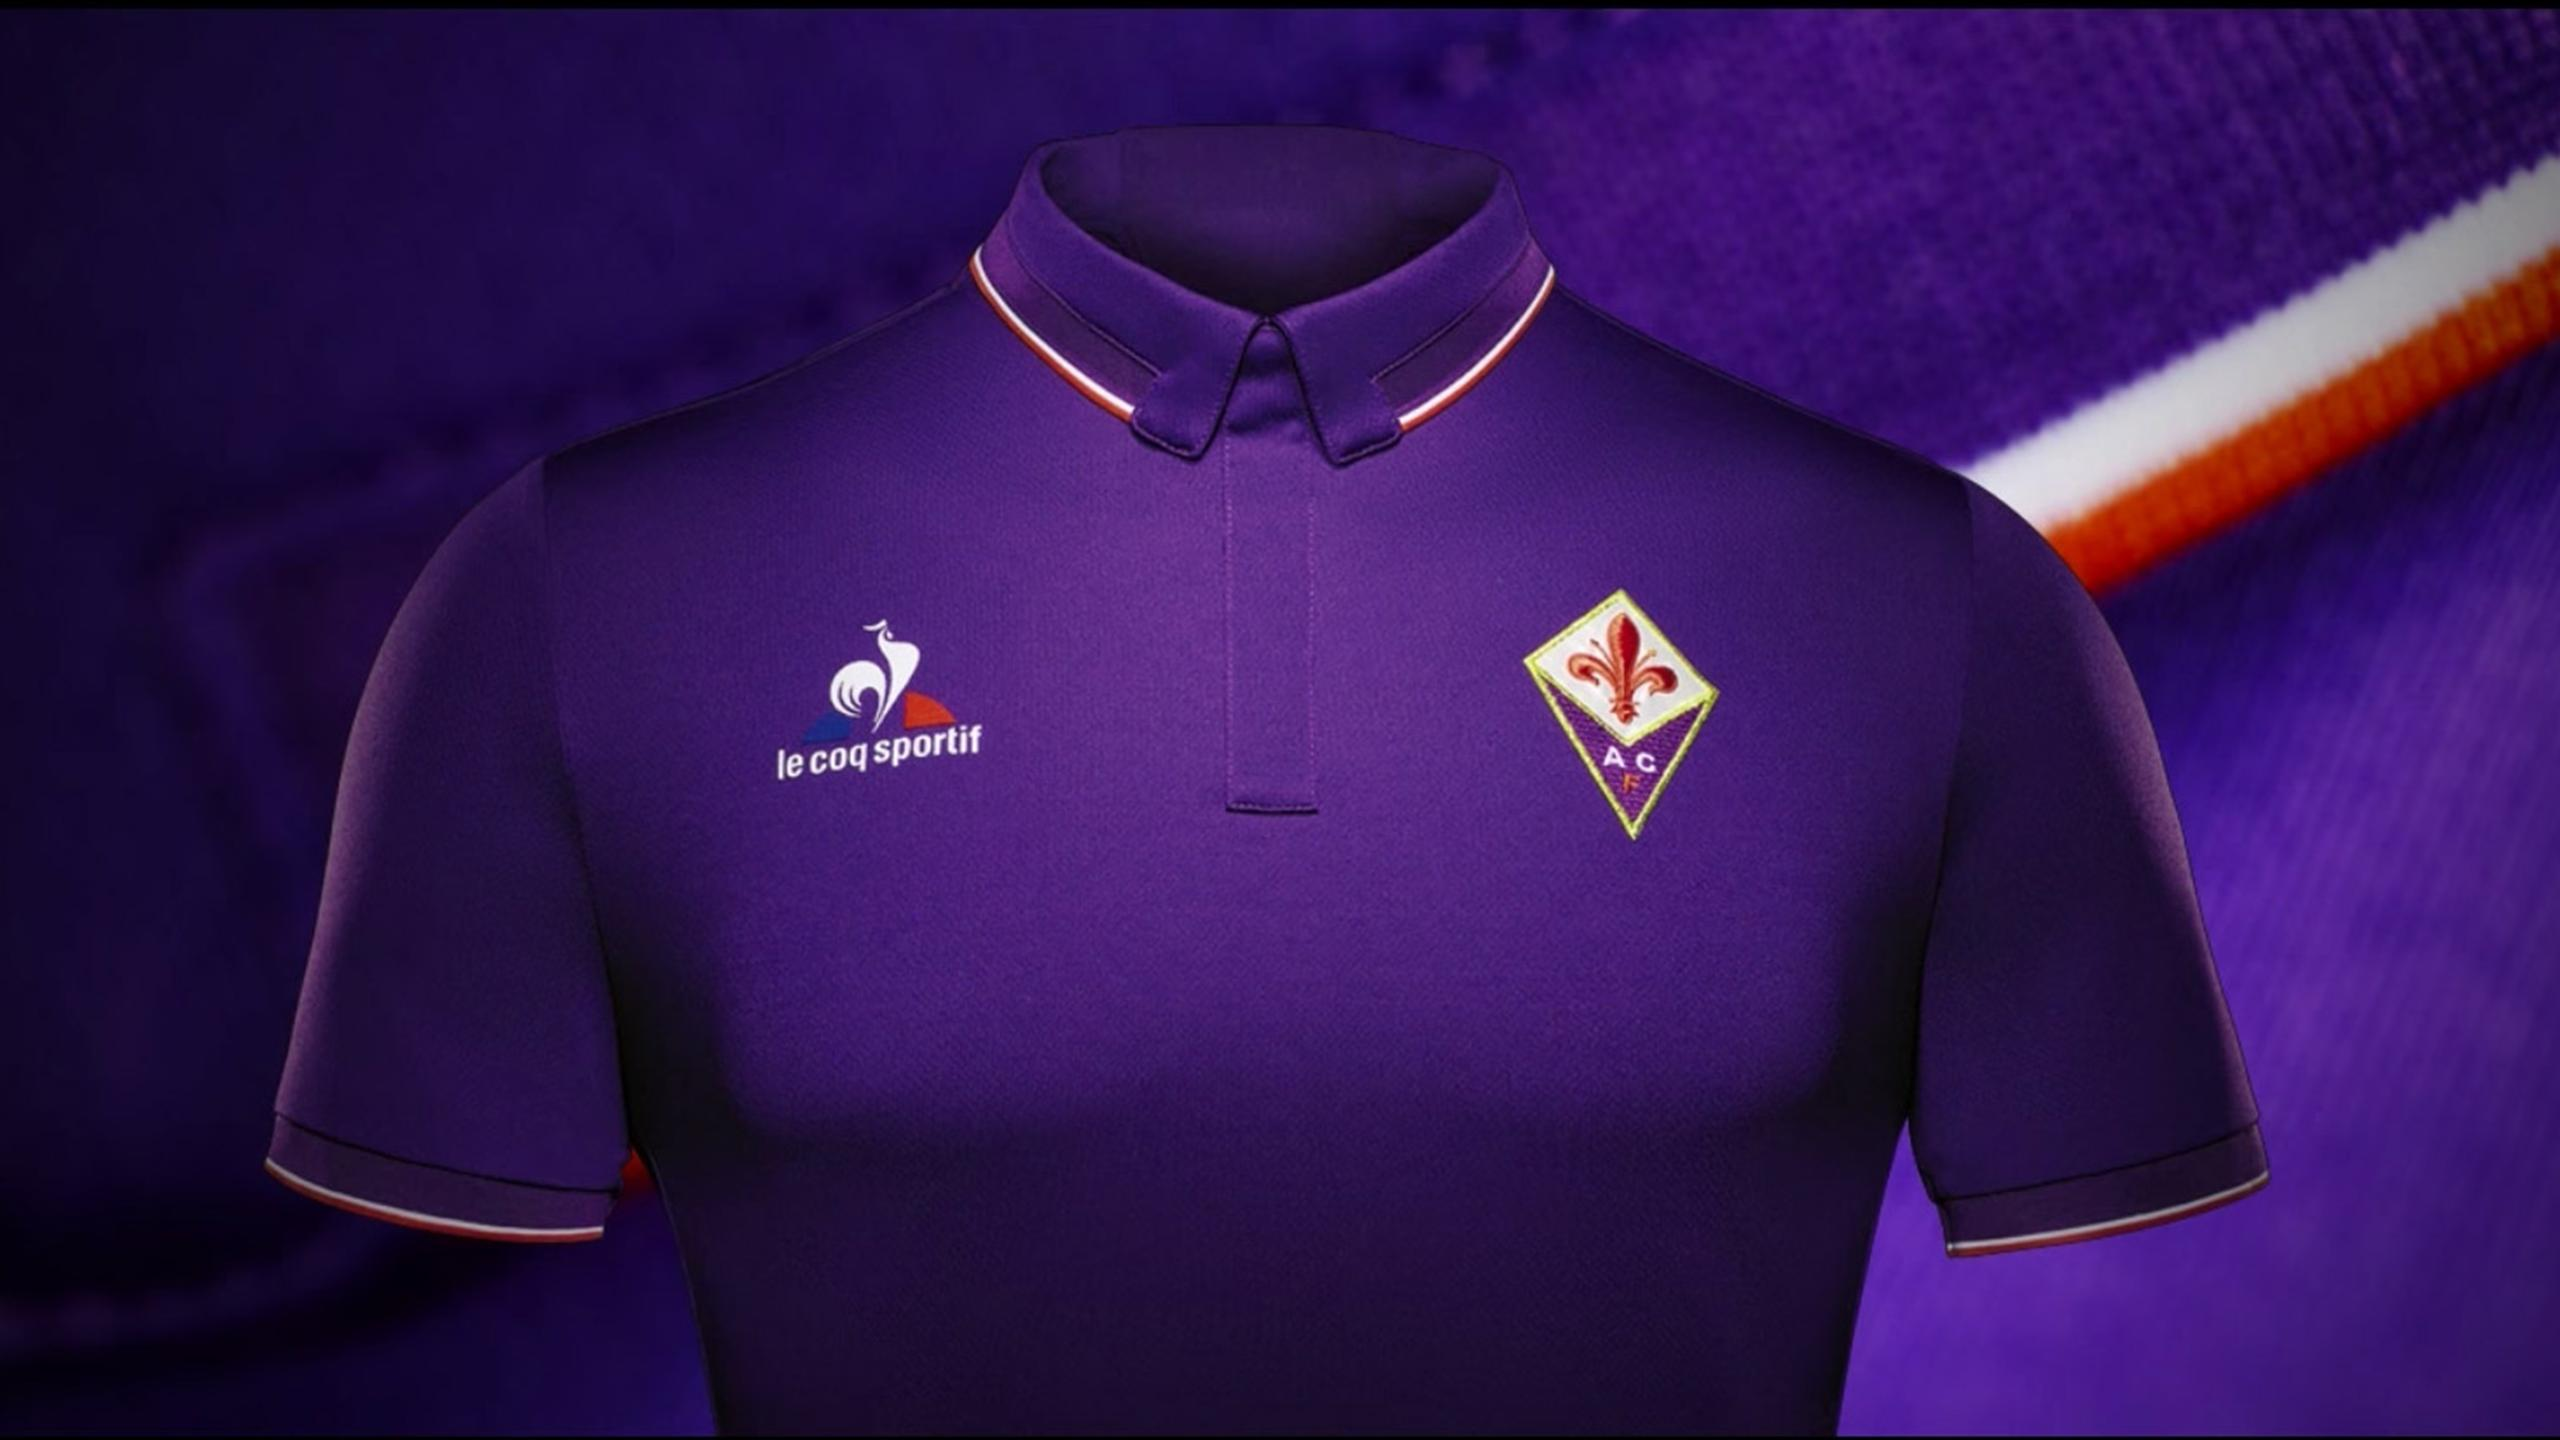 Maillot Extérieur Fiorentina Tenue de match